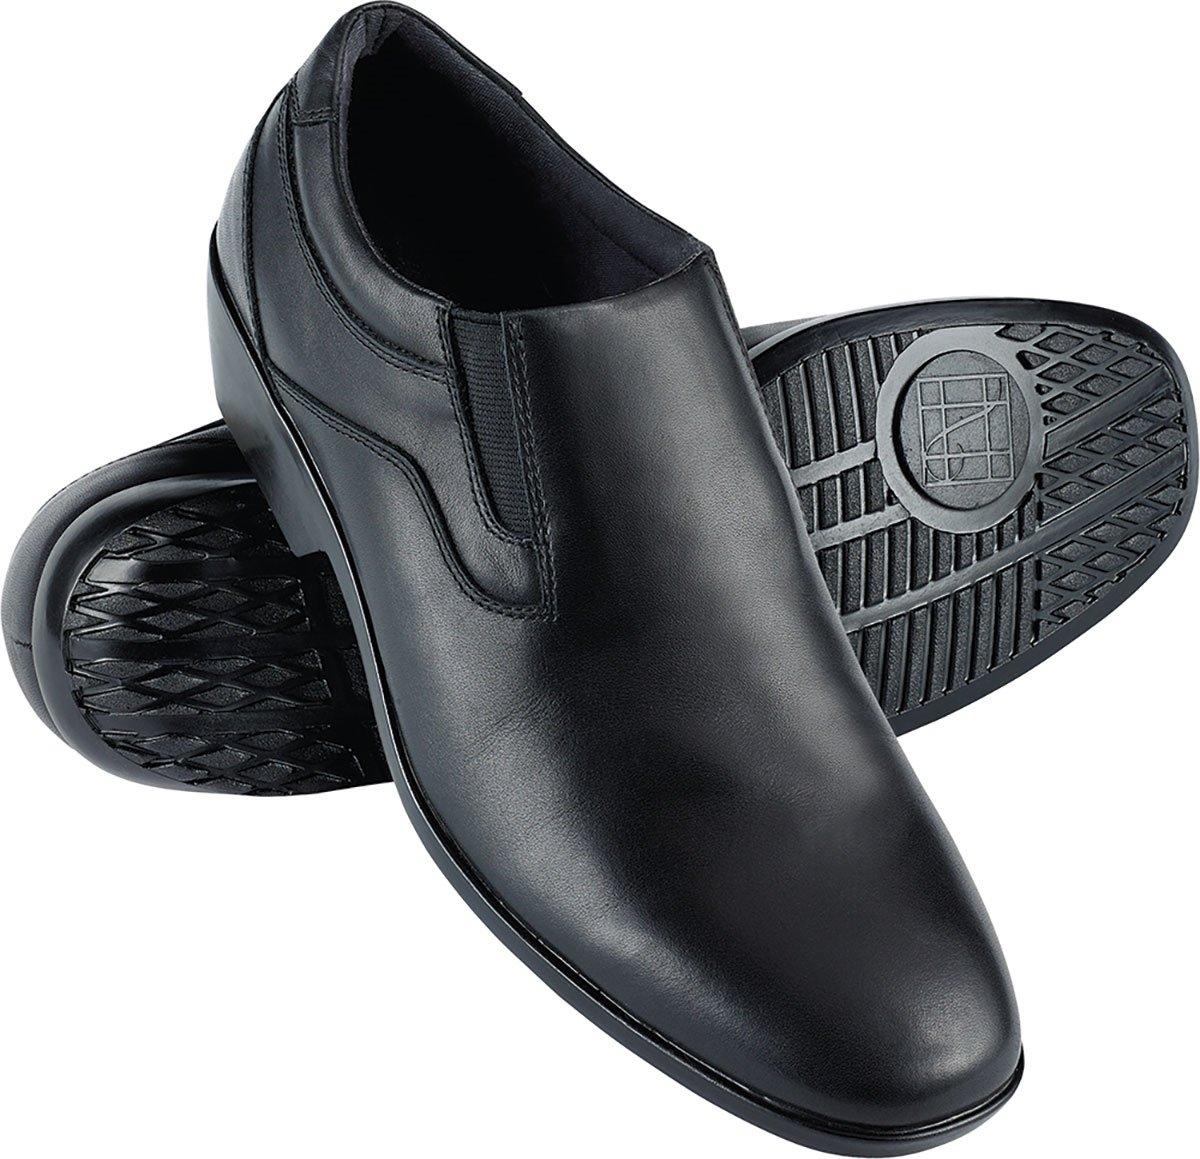 Style Plus Women's Rev Step Marching Shoe 10W Black